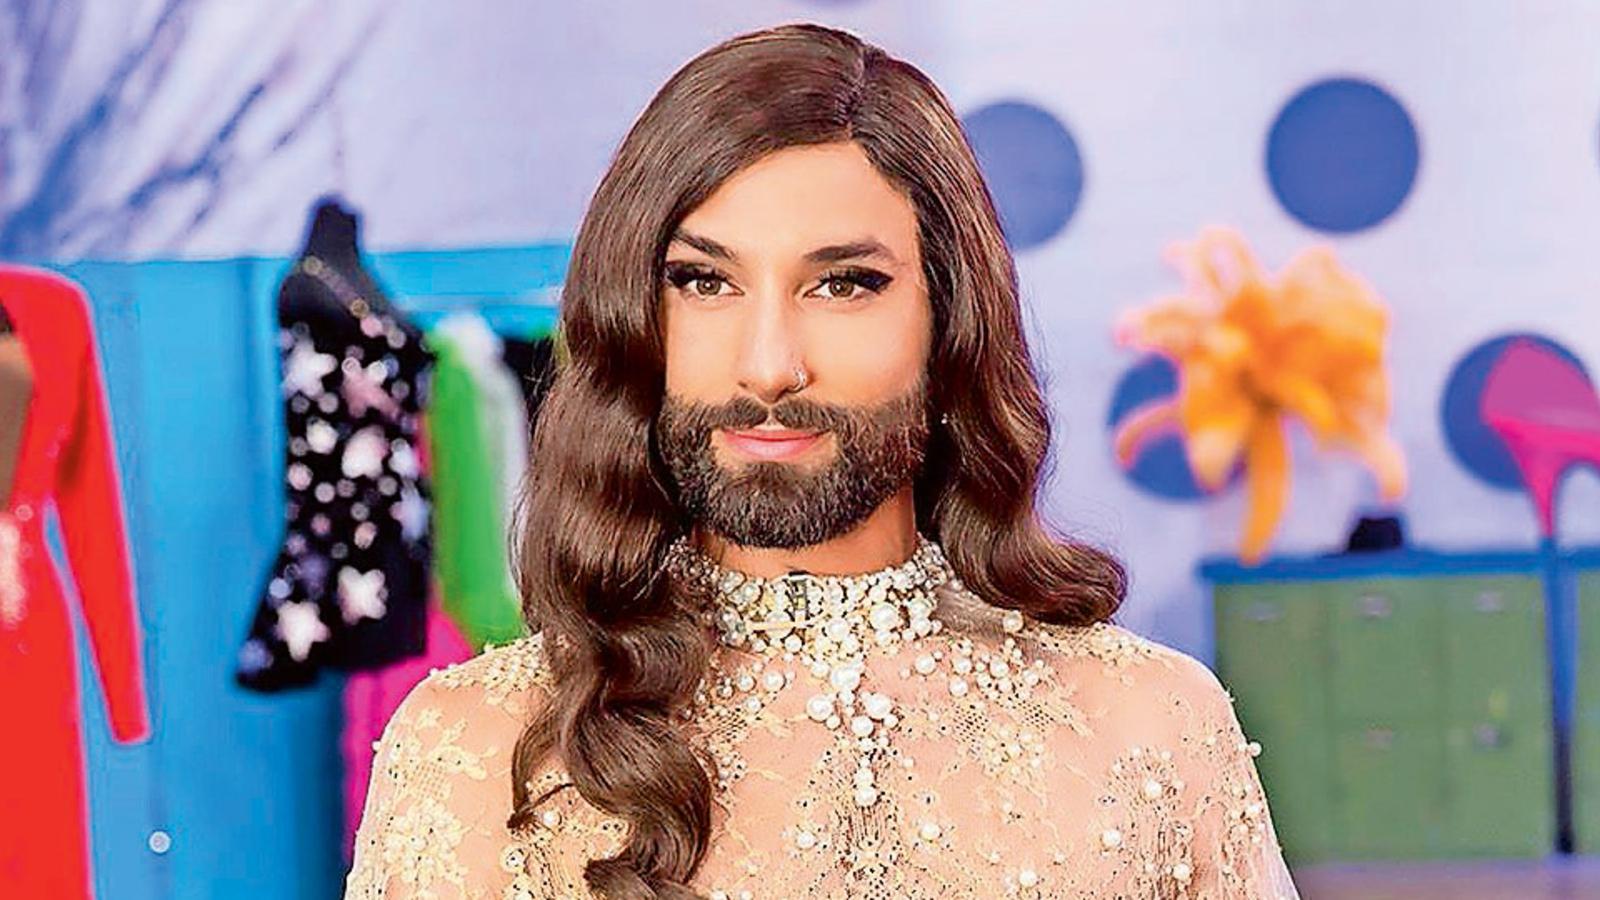 Conchita Wurst nincs pénisz